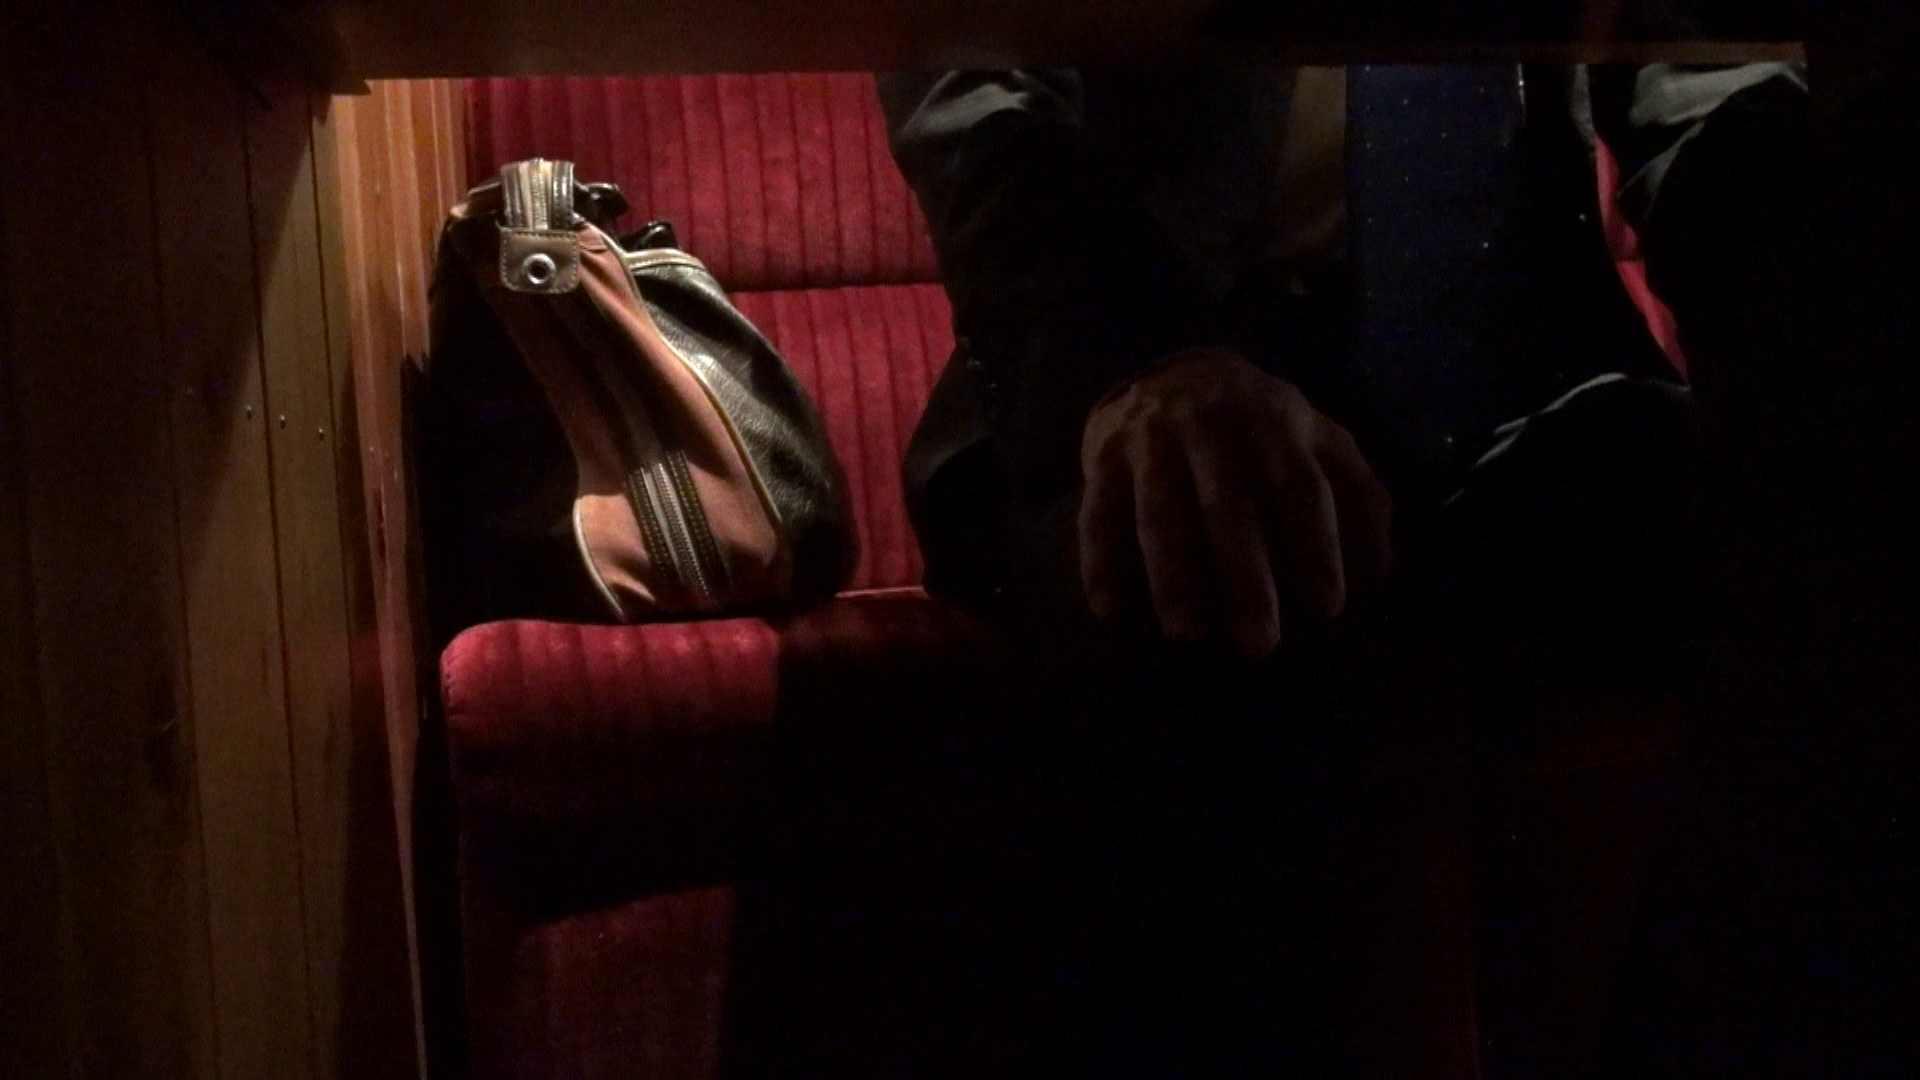 episode1 ヒロトさんと保険外交員との顔合わせ 盗撮 エロ無料画像 71pic 37